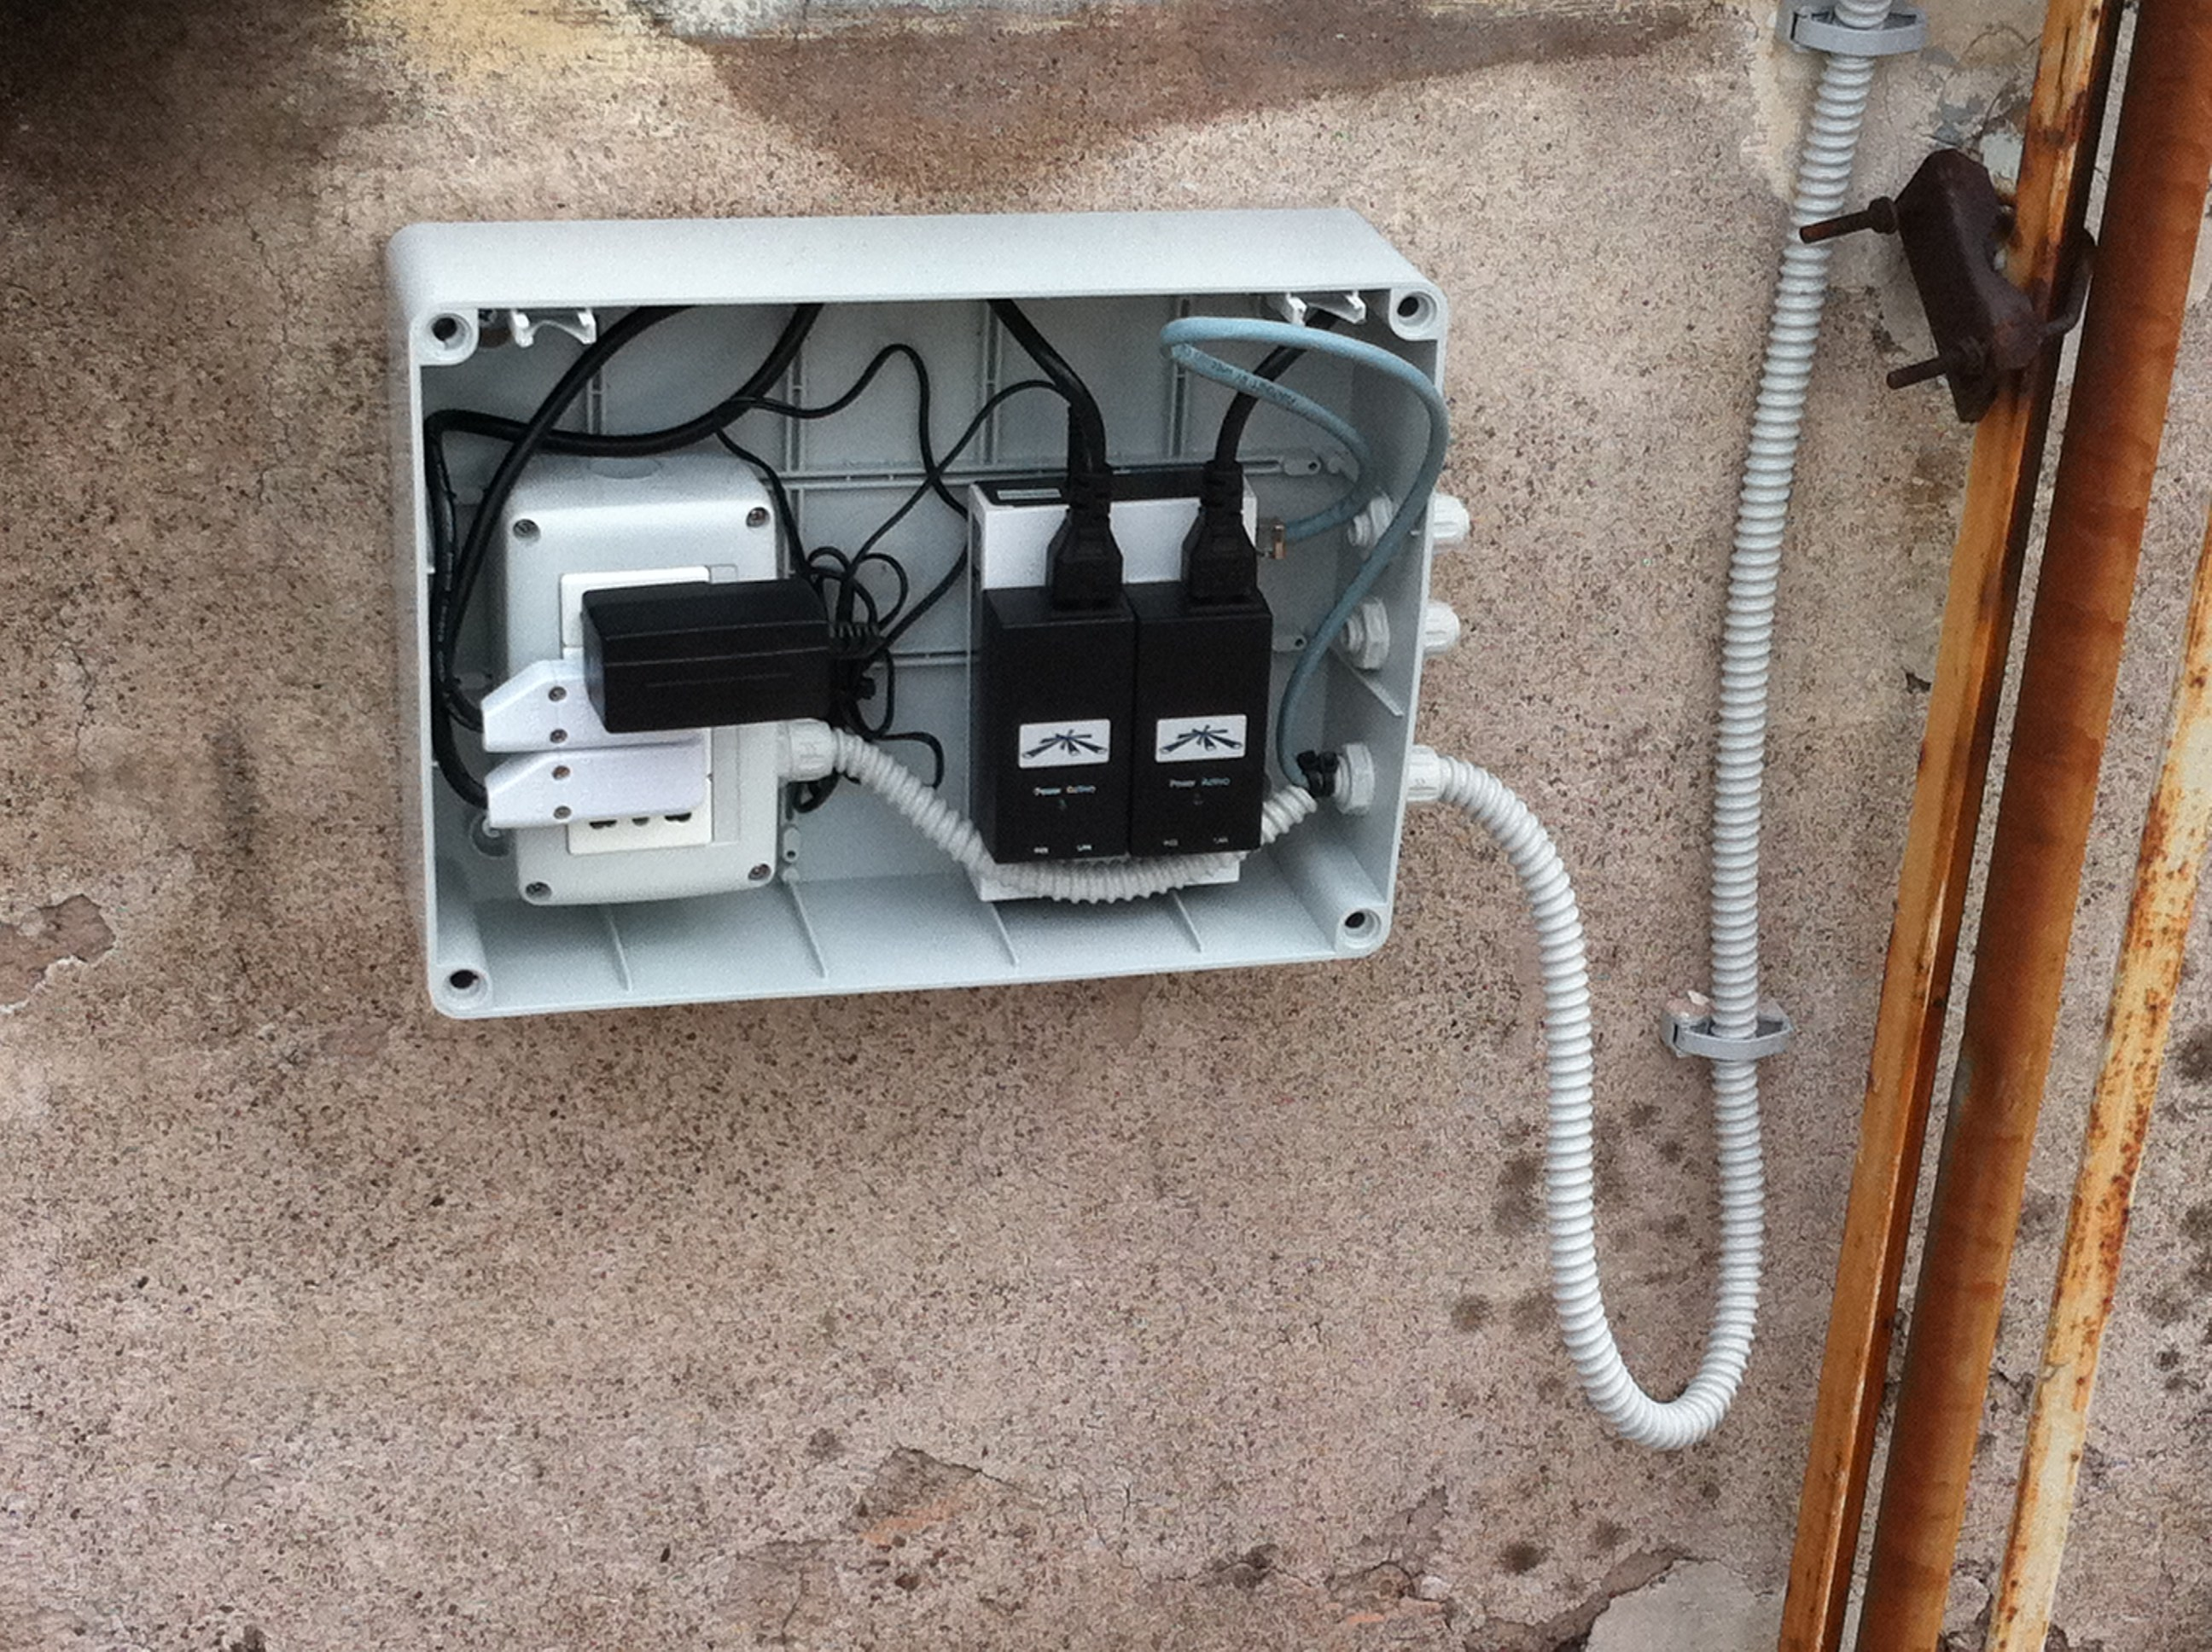 Wireless community blog archive ninux verso - Impianto elettrico esterno canaline ...